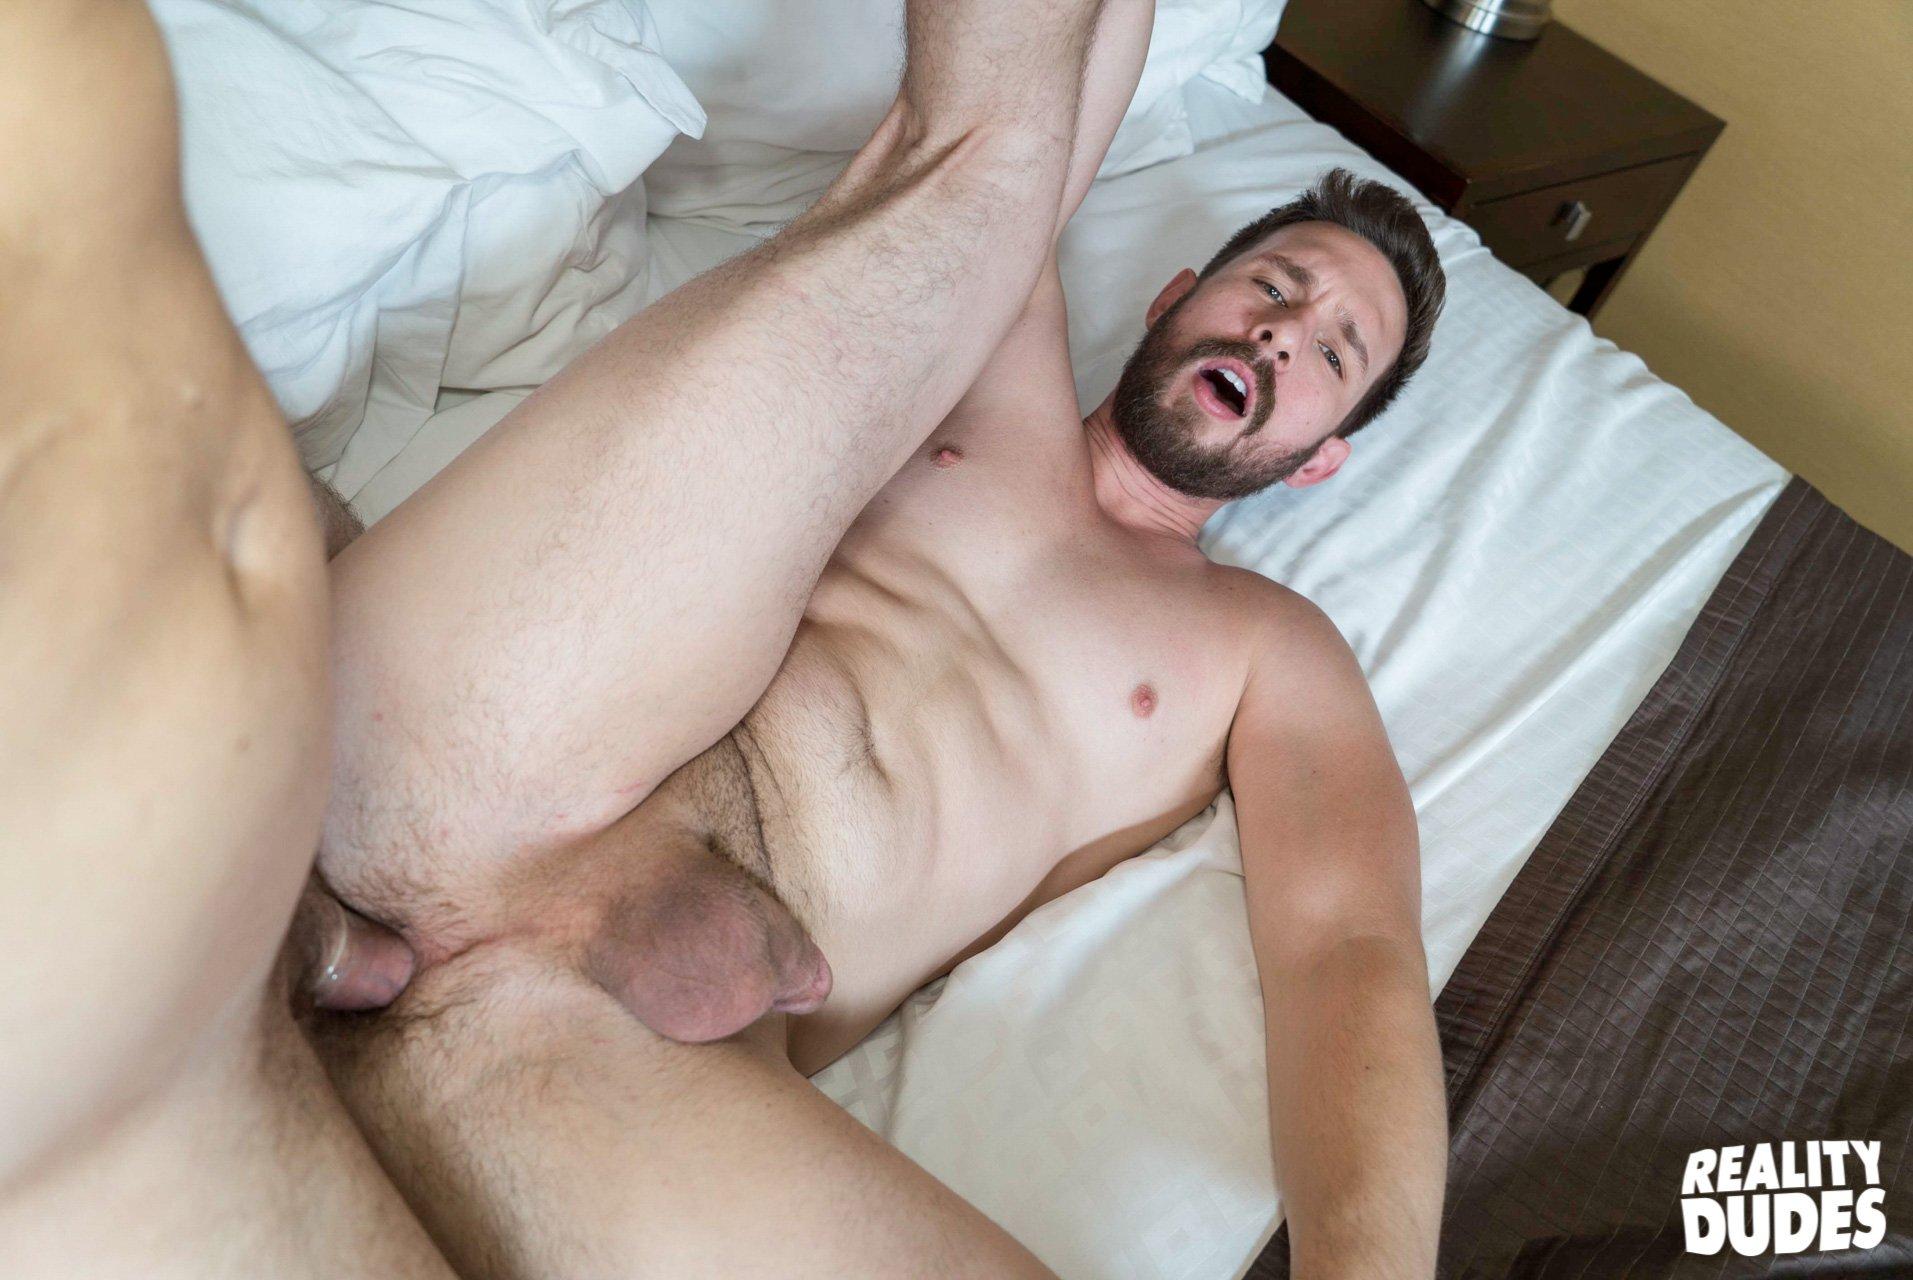 kissing and licking. Big dick niggas porn very good